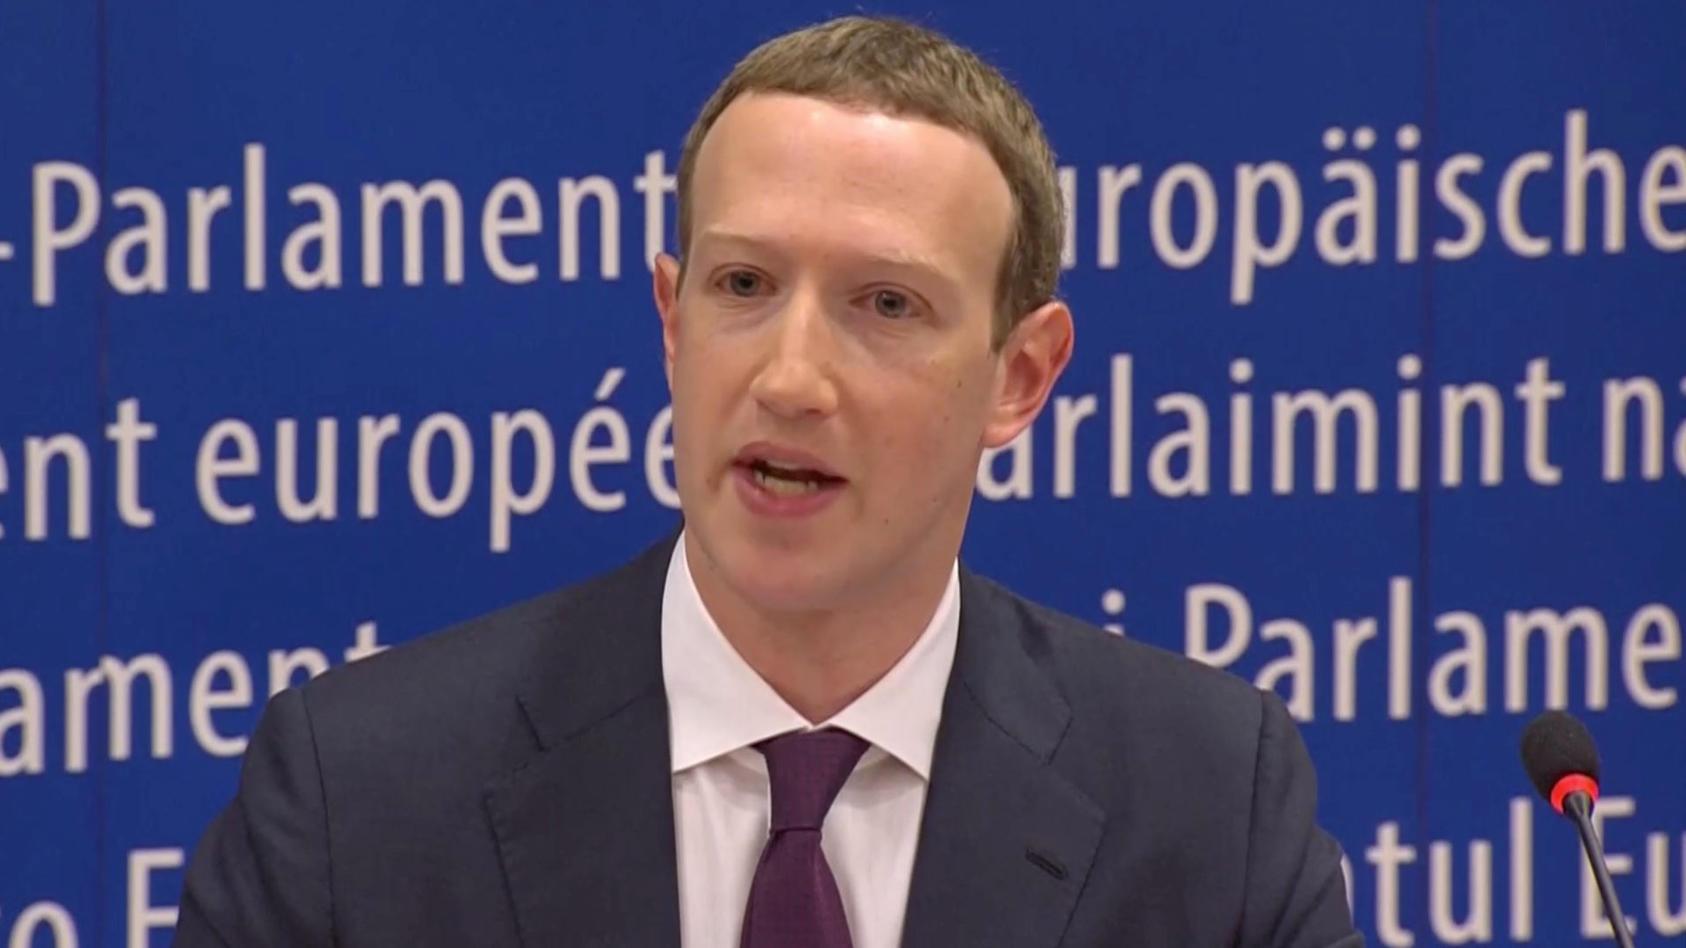 Facebook-Chef Mark Zuckerberg muss sich erklären: Im EU-Parlament in Brüssel stellte er sich den Fragen der Parlamentarier